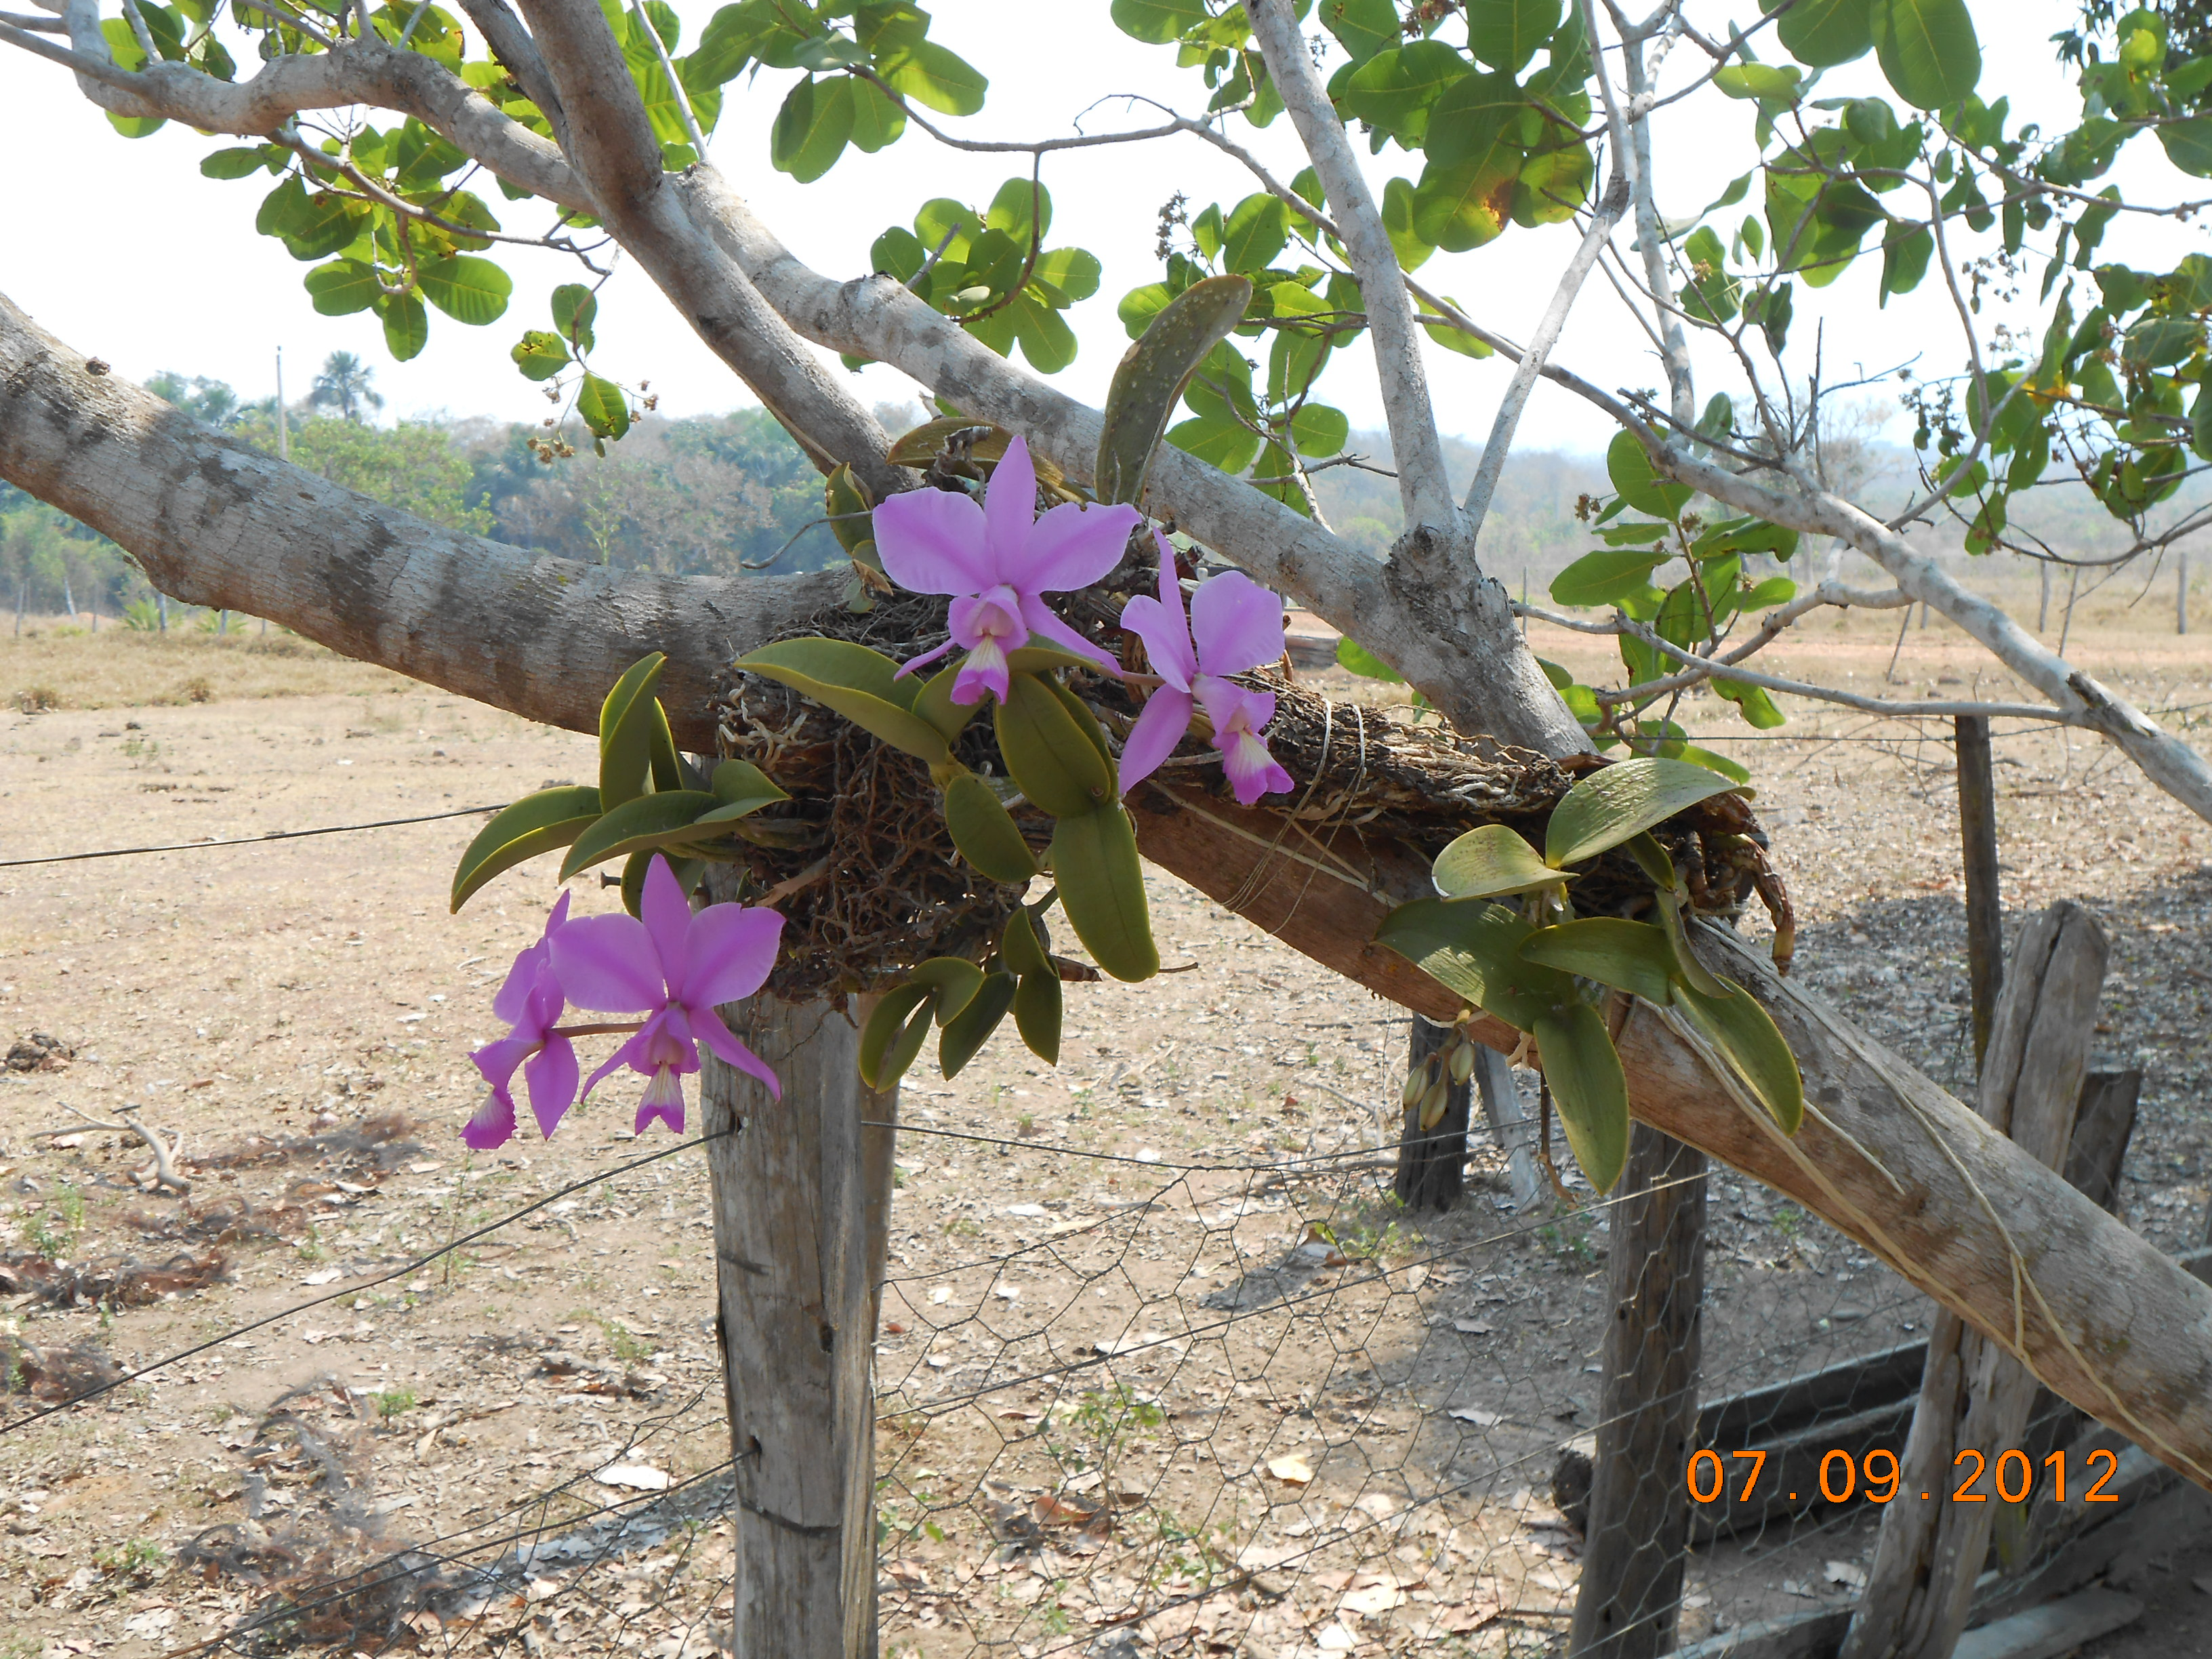 Beleza cênica da orquídea do cerrado